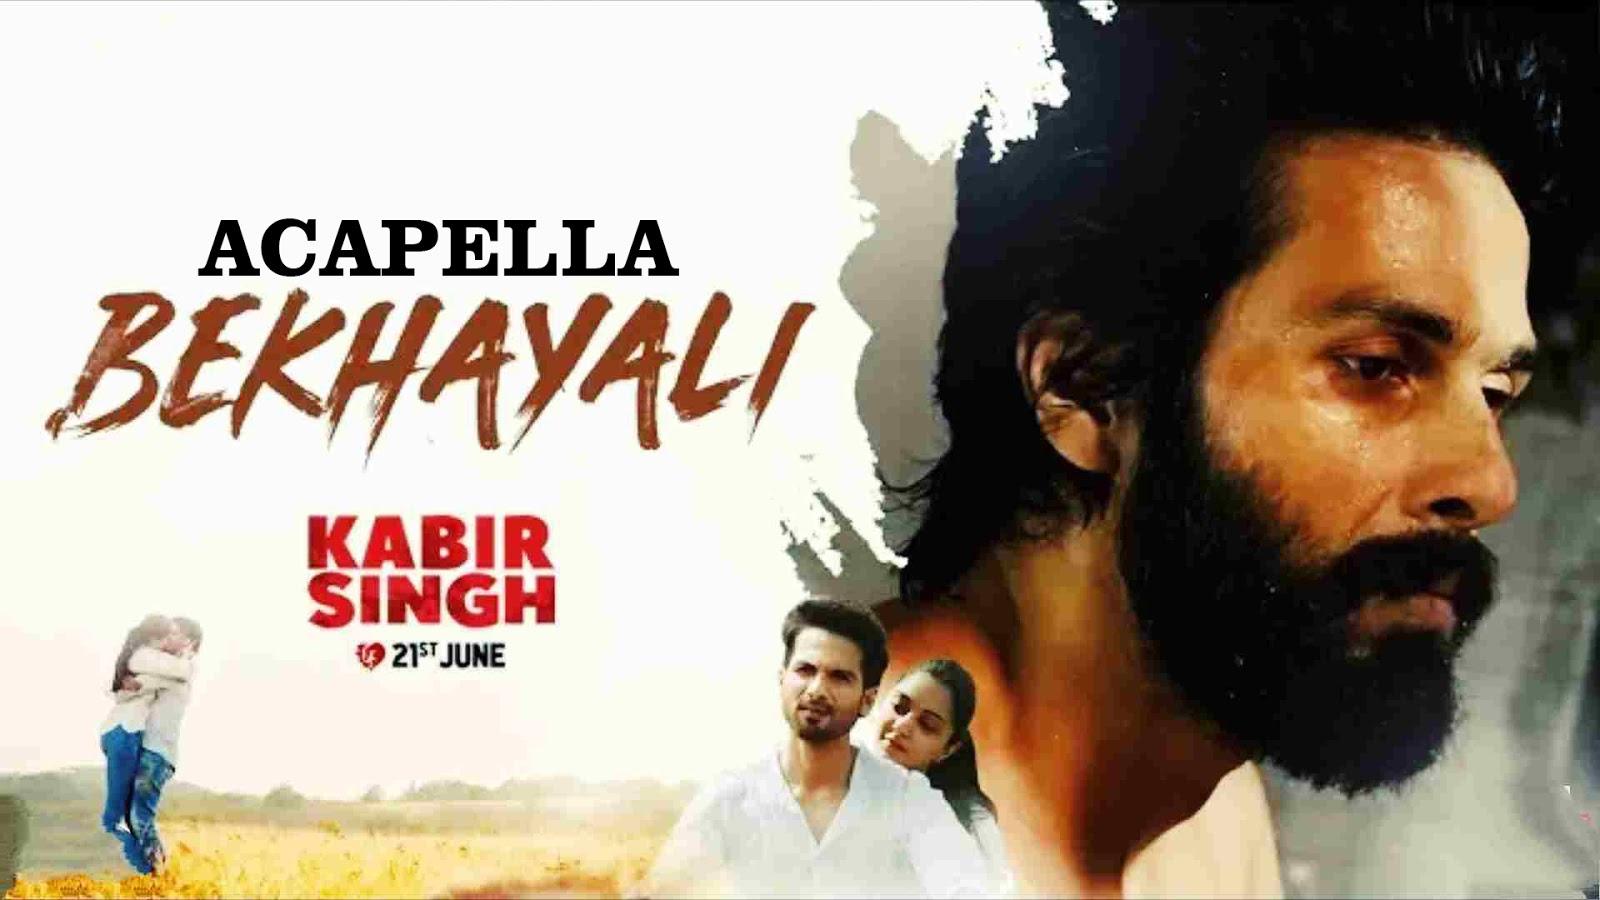 Bekhayali Acapella Free Download | Kabir Singh - Bollywood